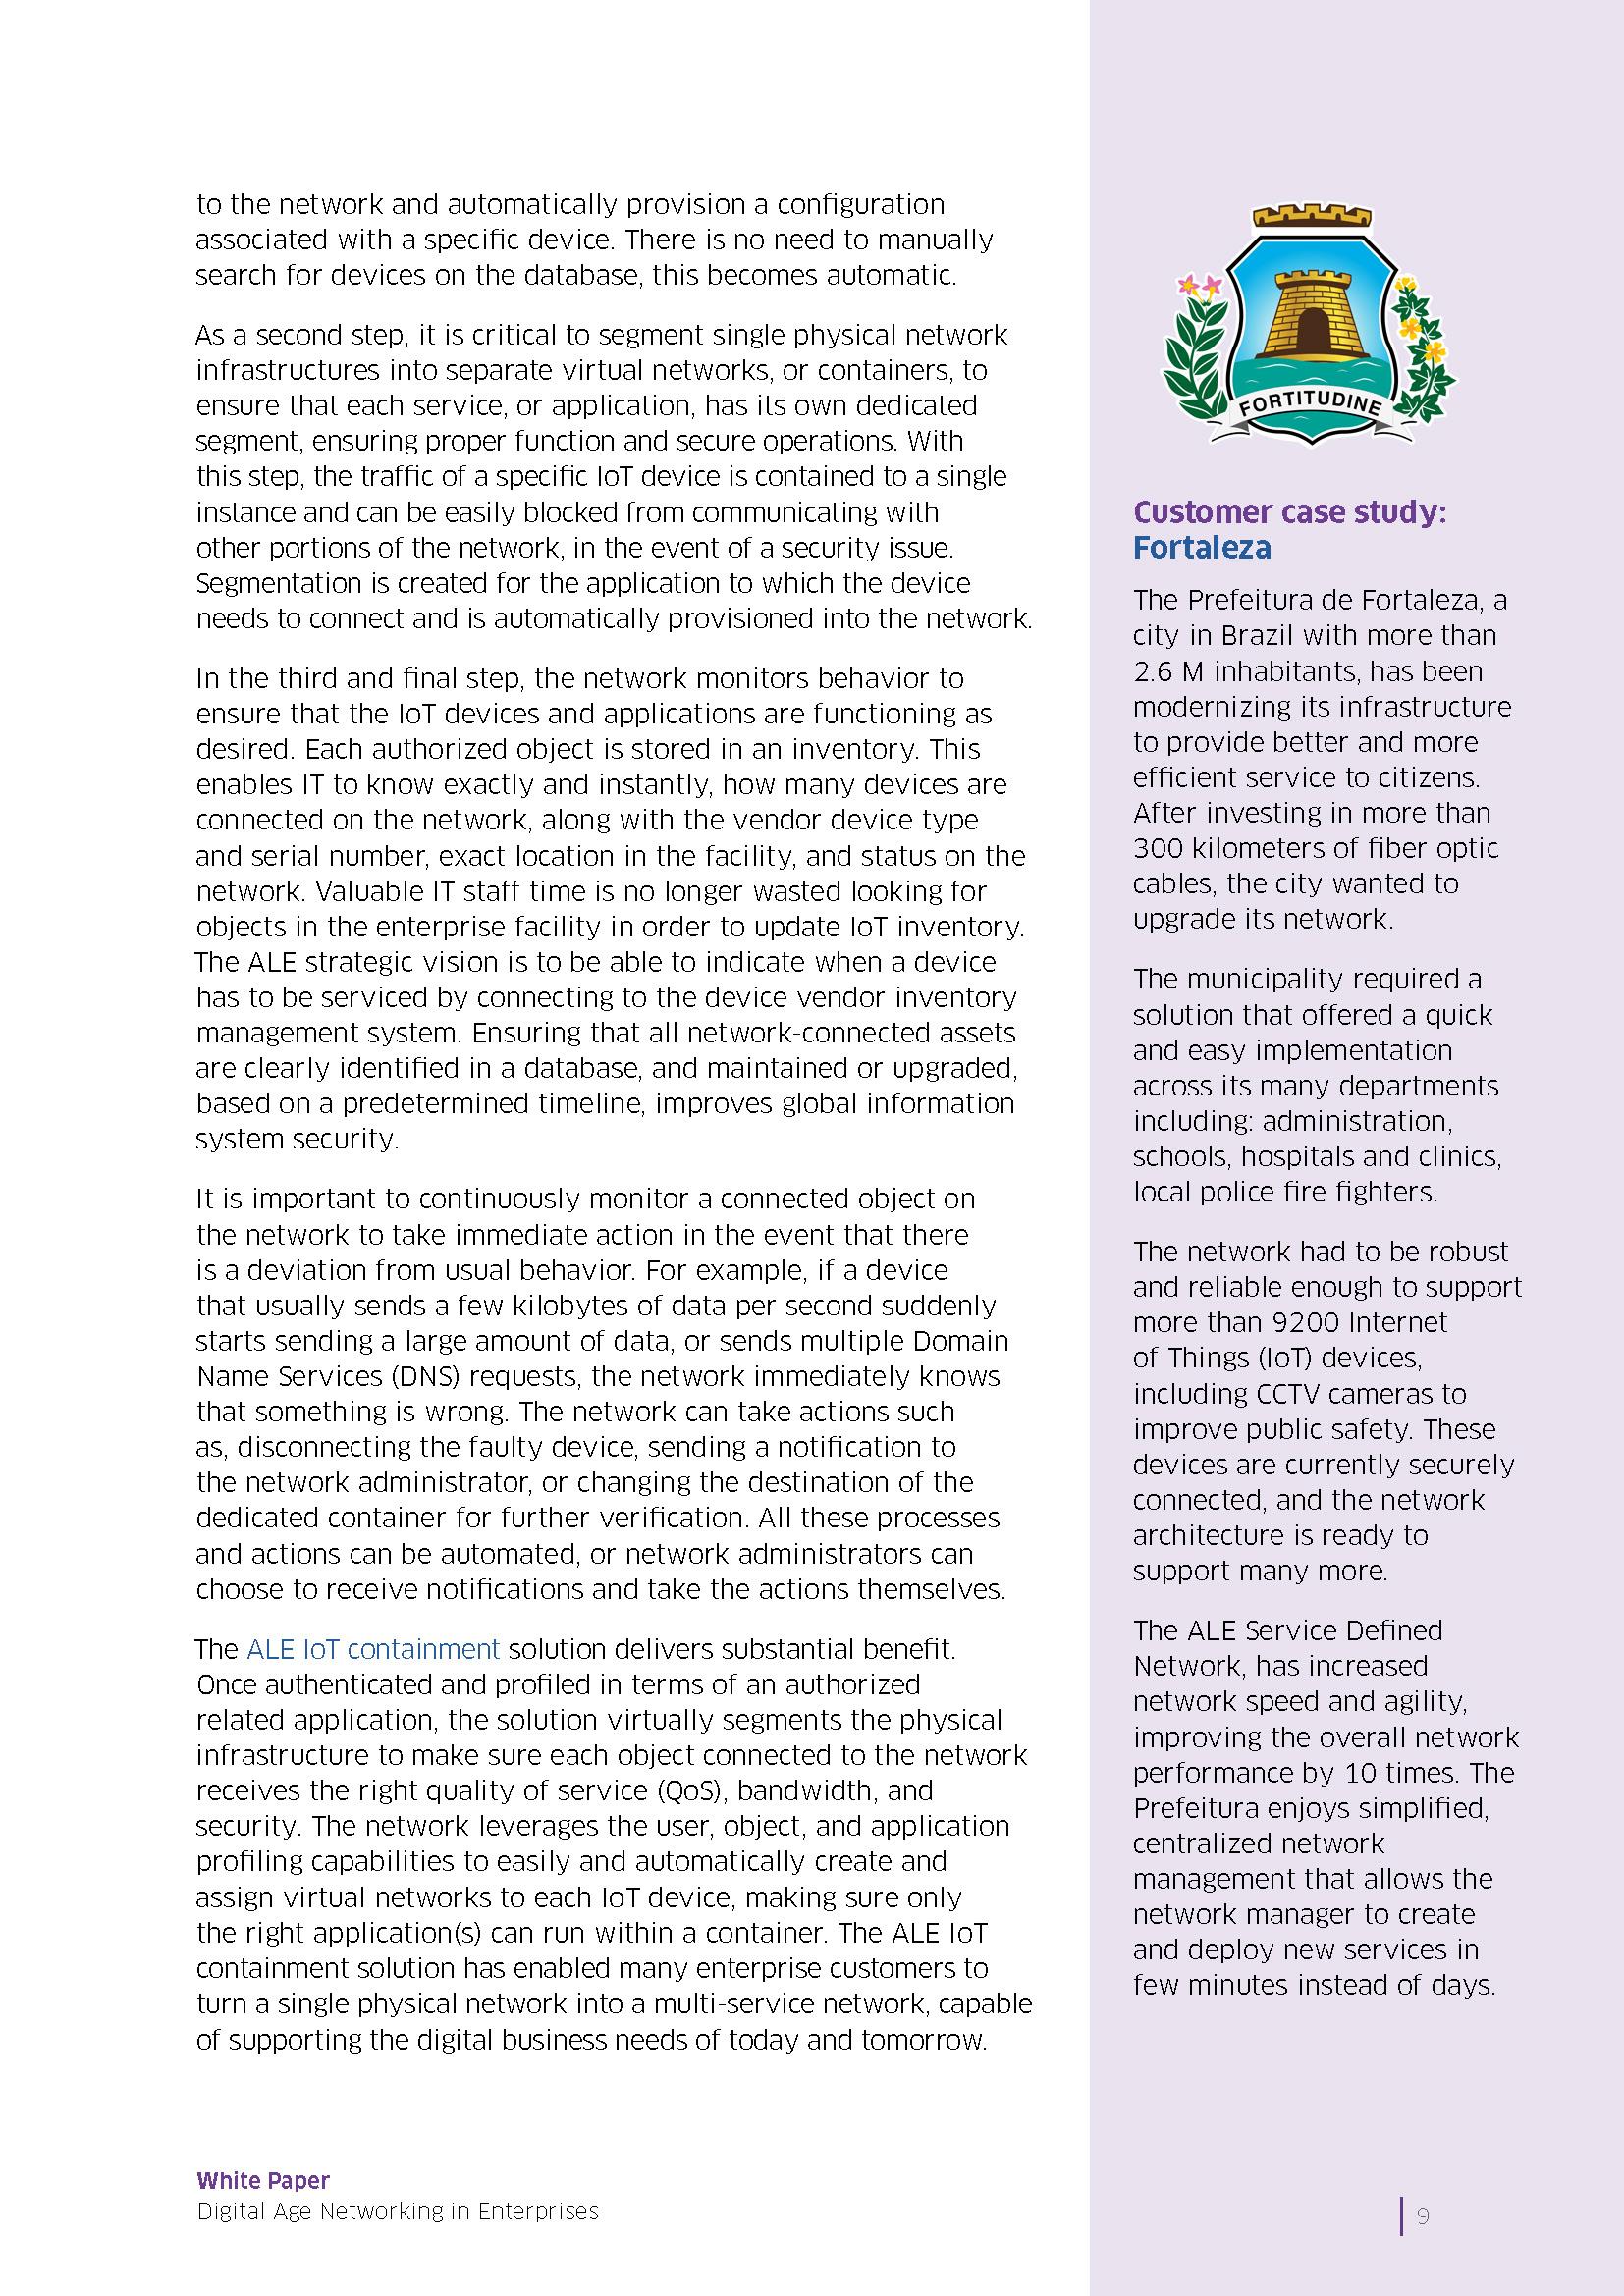 digital-age-networking-enterprises_Page_09